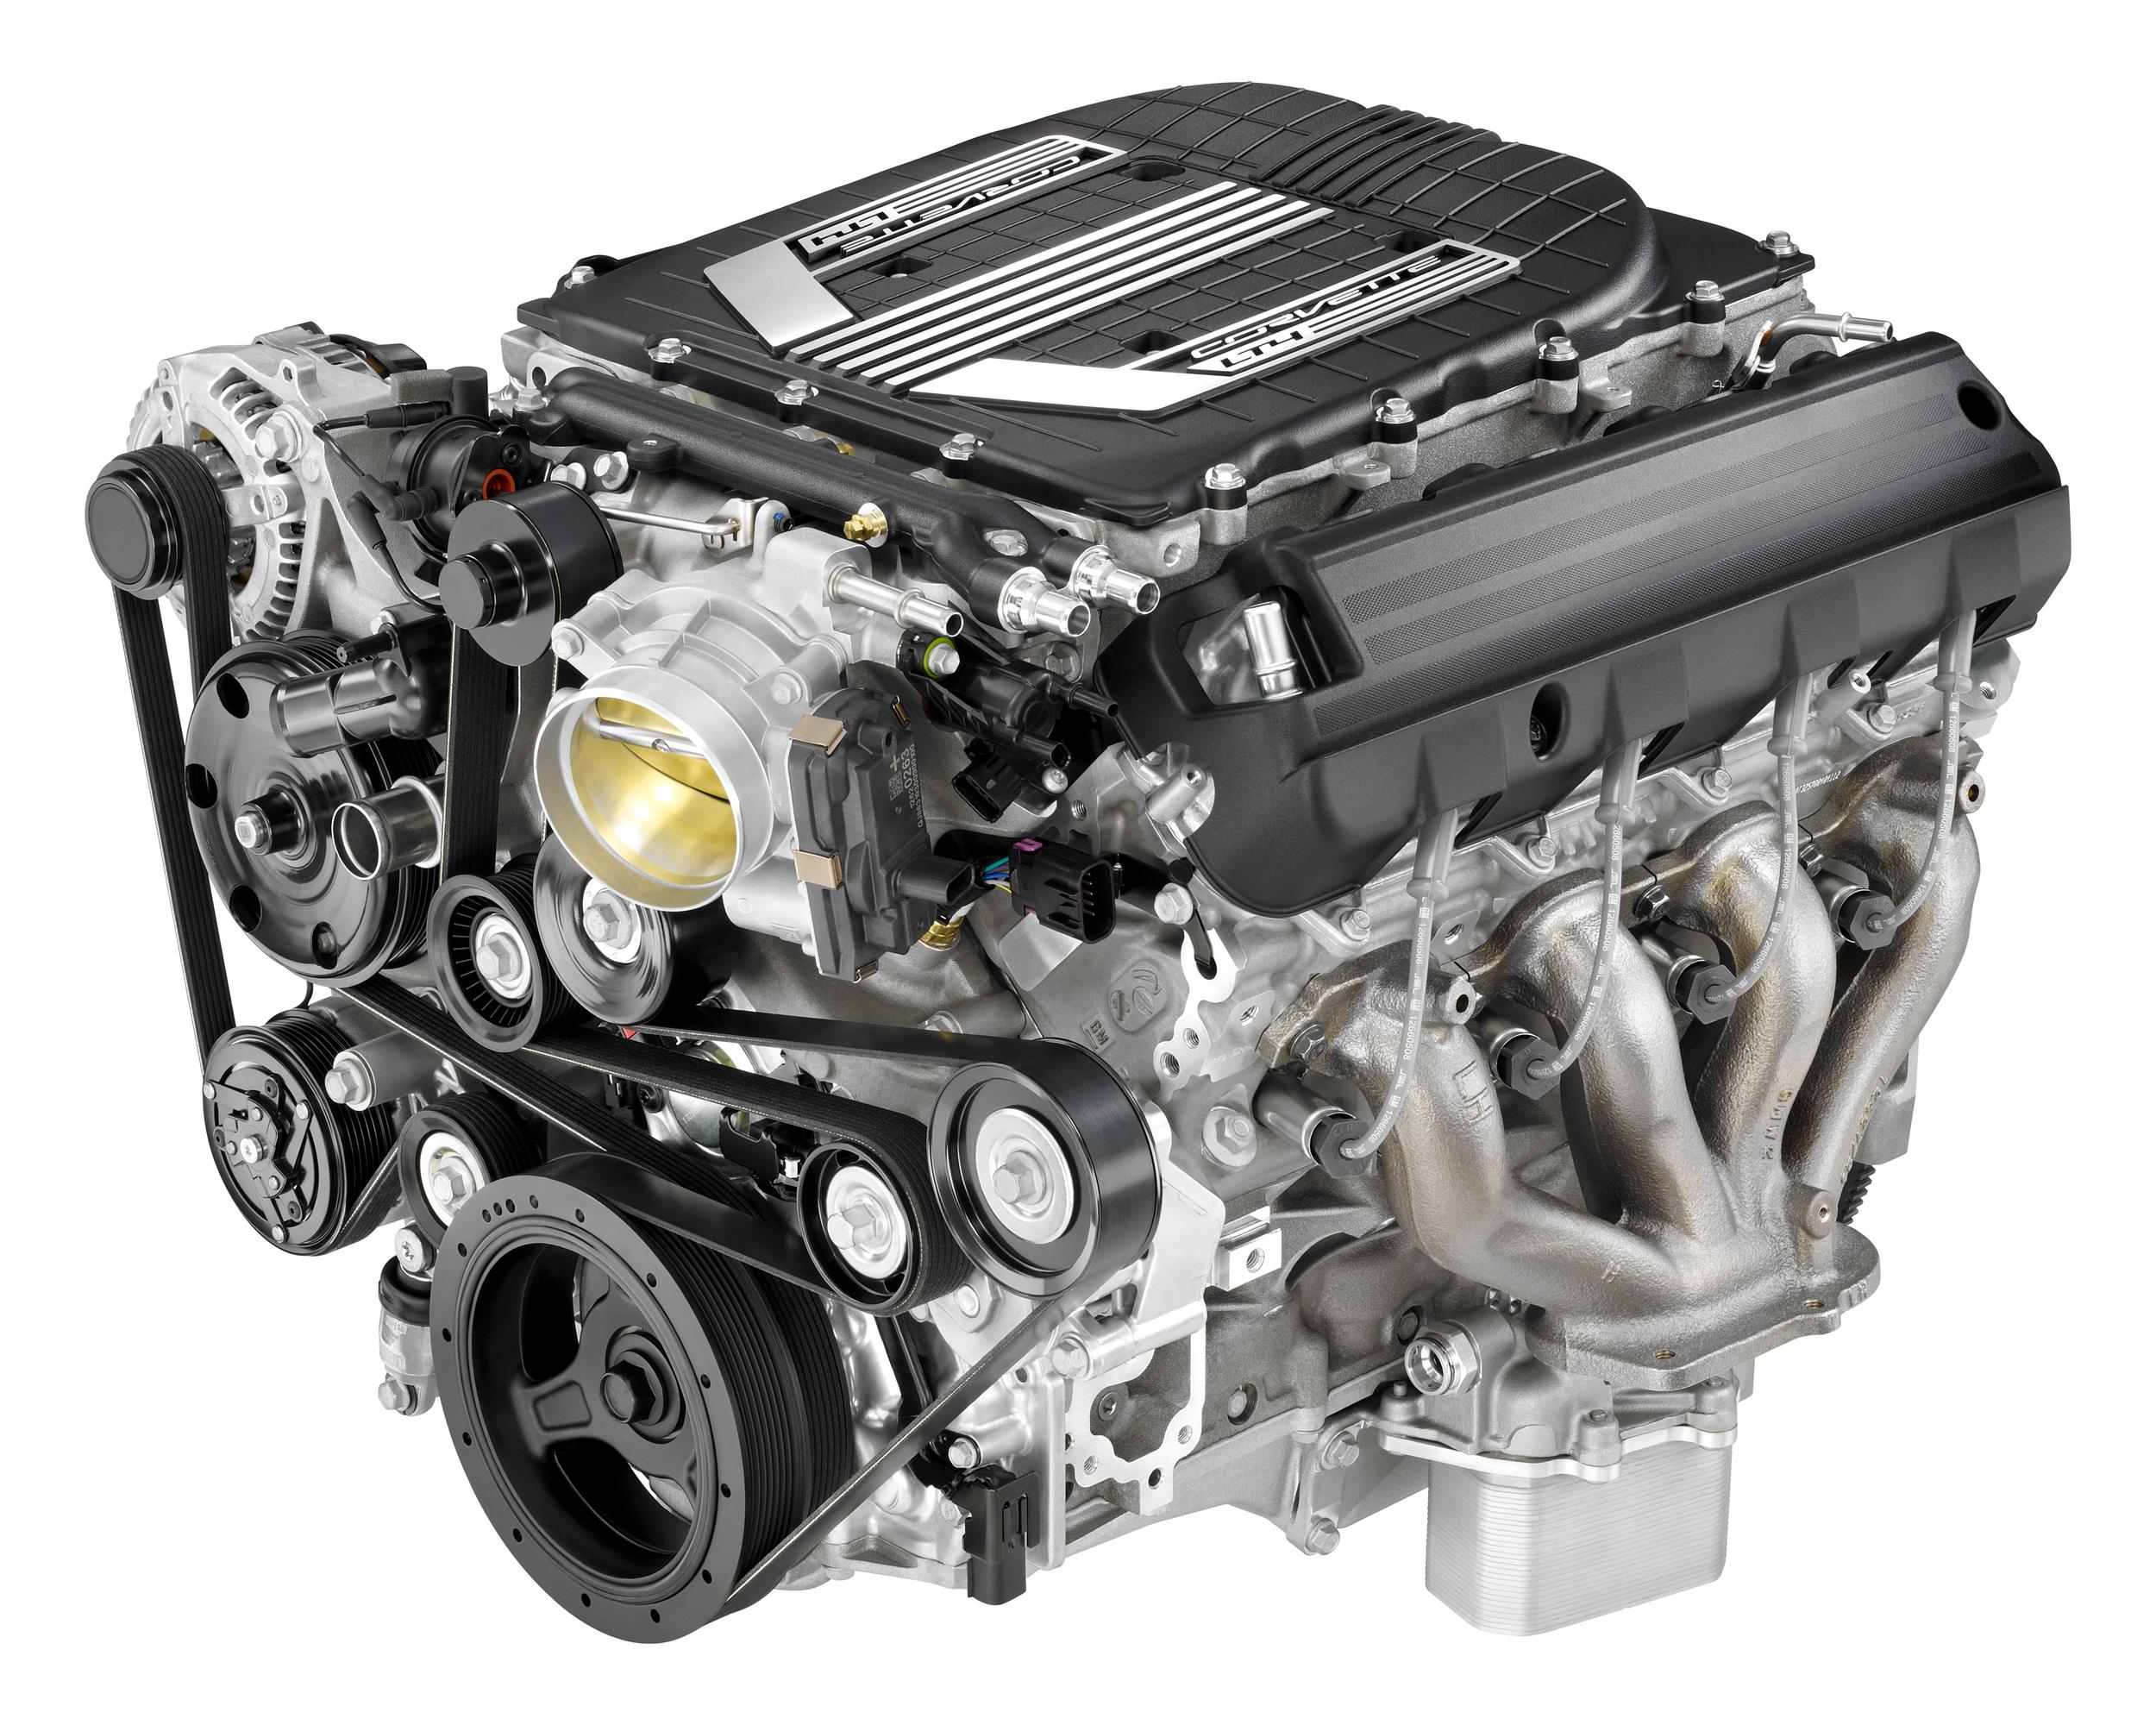 The 6.2-litre, 650 hp supercharged LT4 V8.